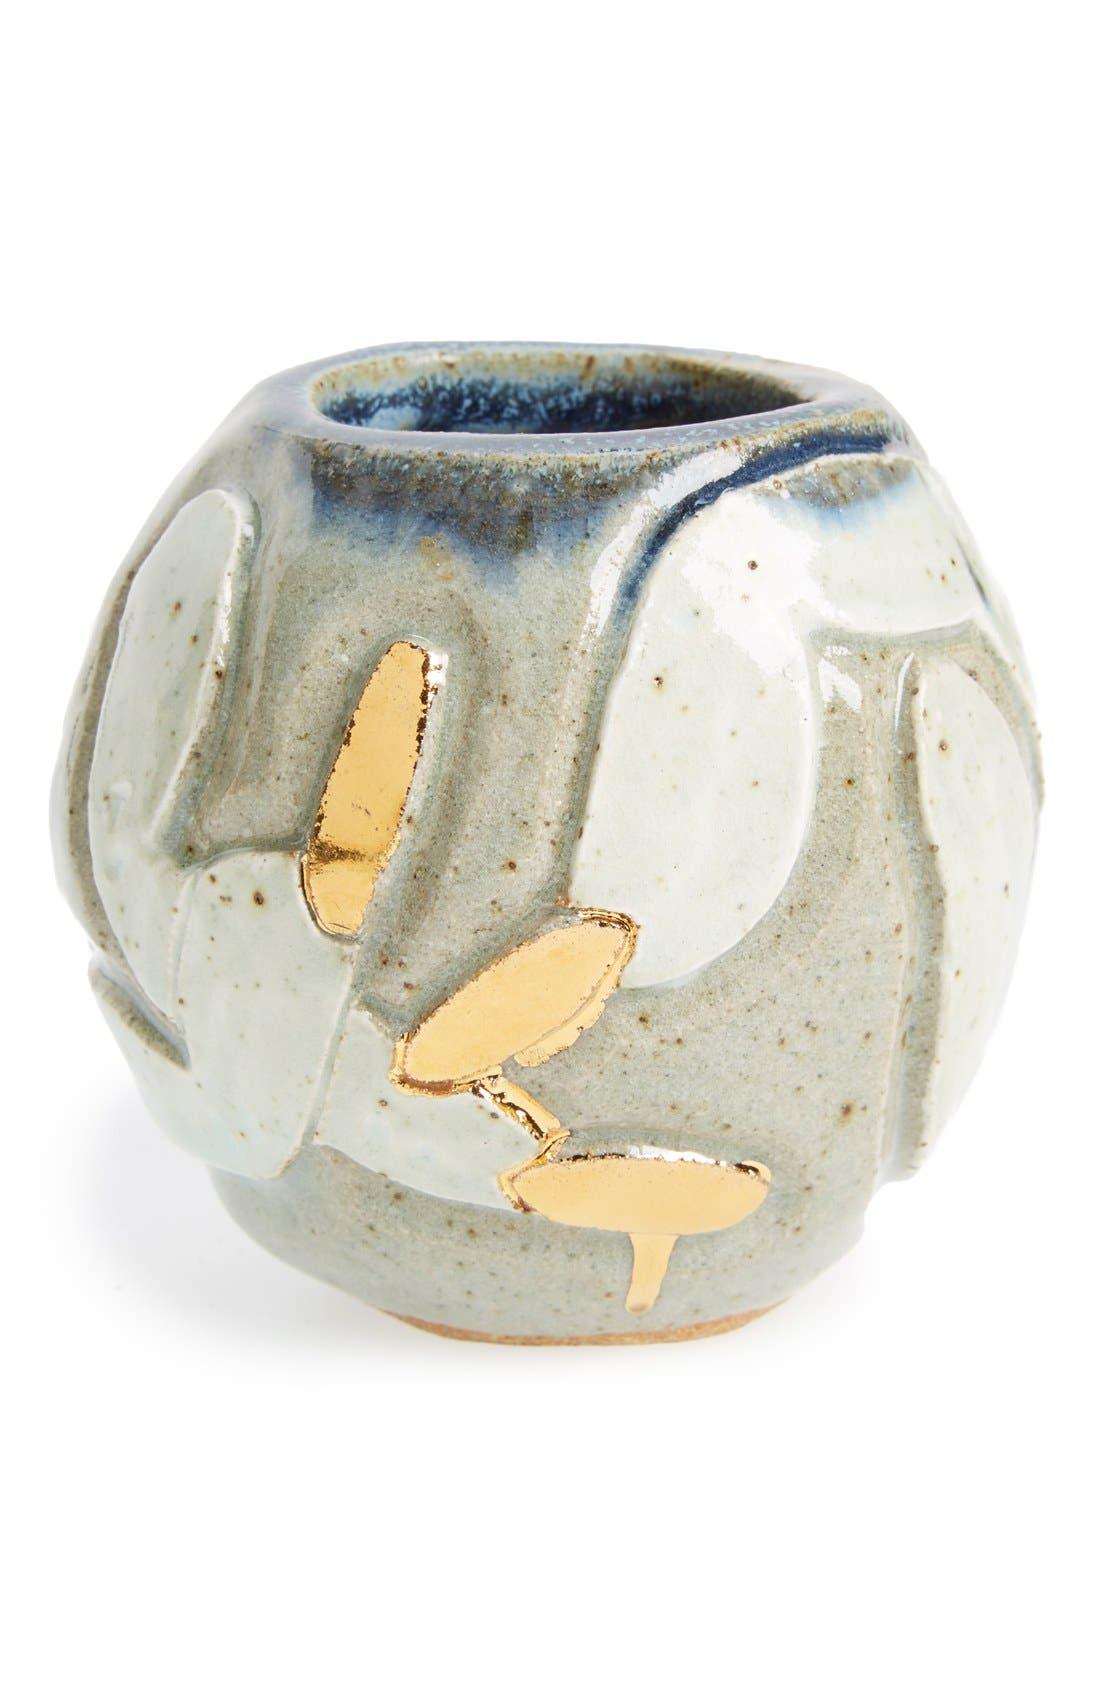 Alternate Image 1 Selected - BZIPPY & CO. 'Nails' Handmade Ceramic Vase